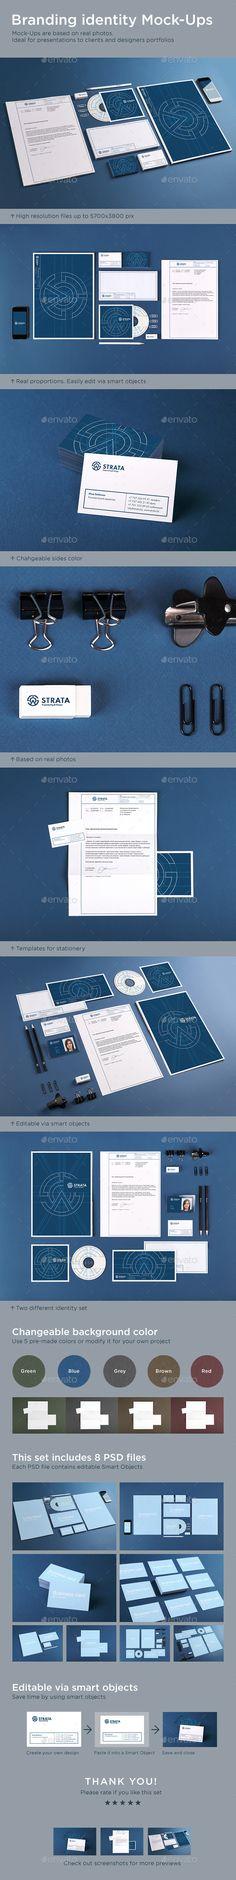 Branding Identity Mock-Ups | Download: http://graphicriver.net/item/branding-identity-mockups/9218158?ref=ksioks